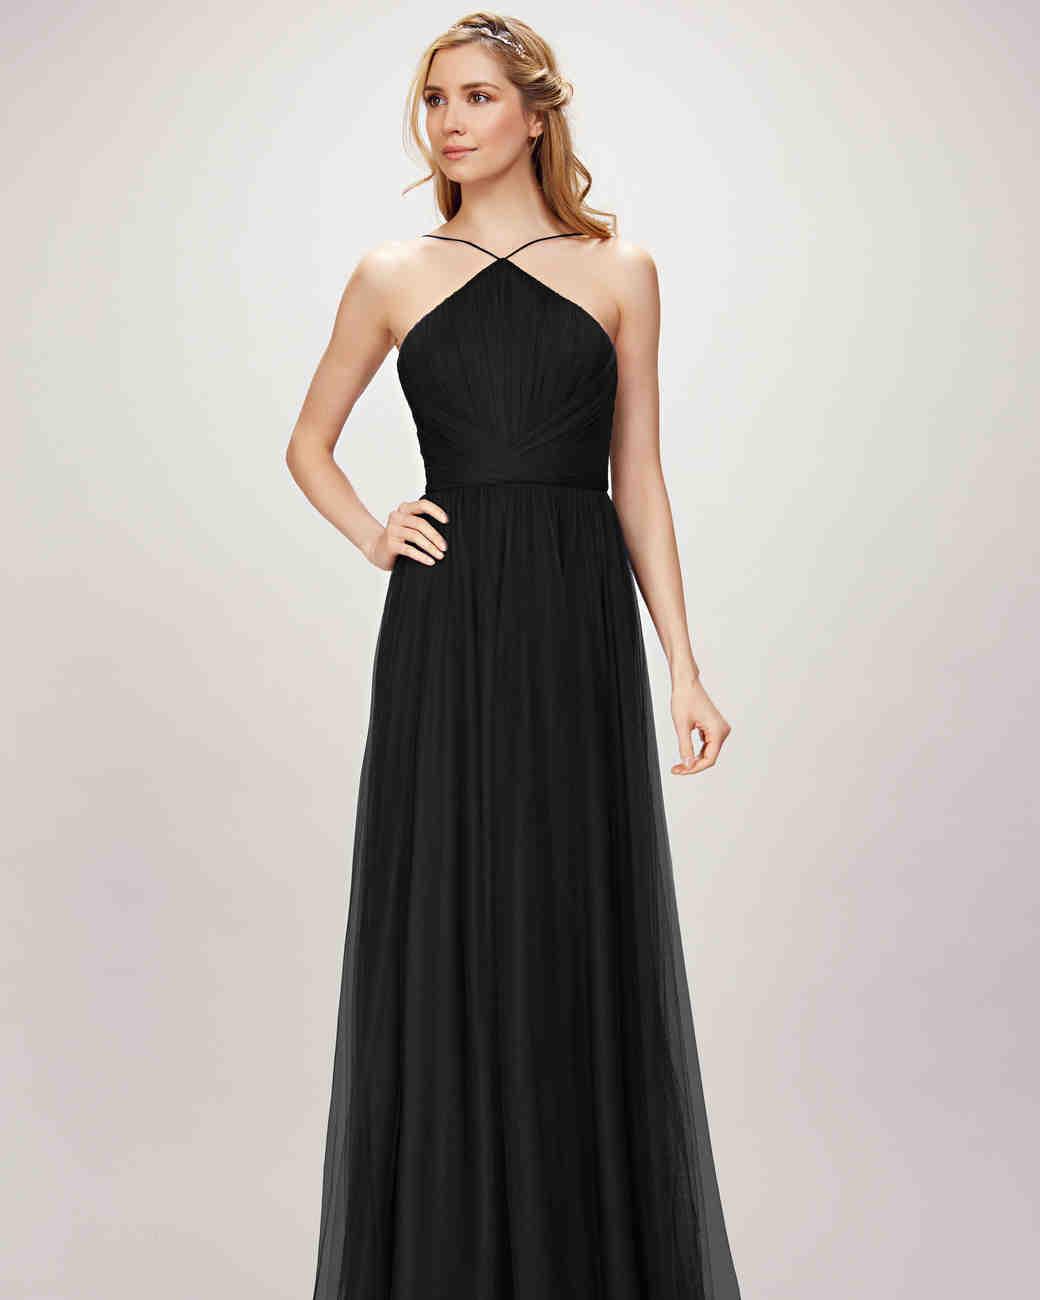 Black bridesmaid dresses images for Weddings with black bridesmaid dresses